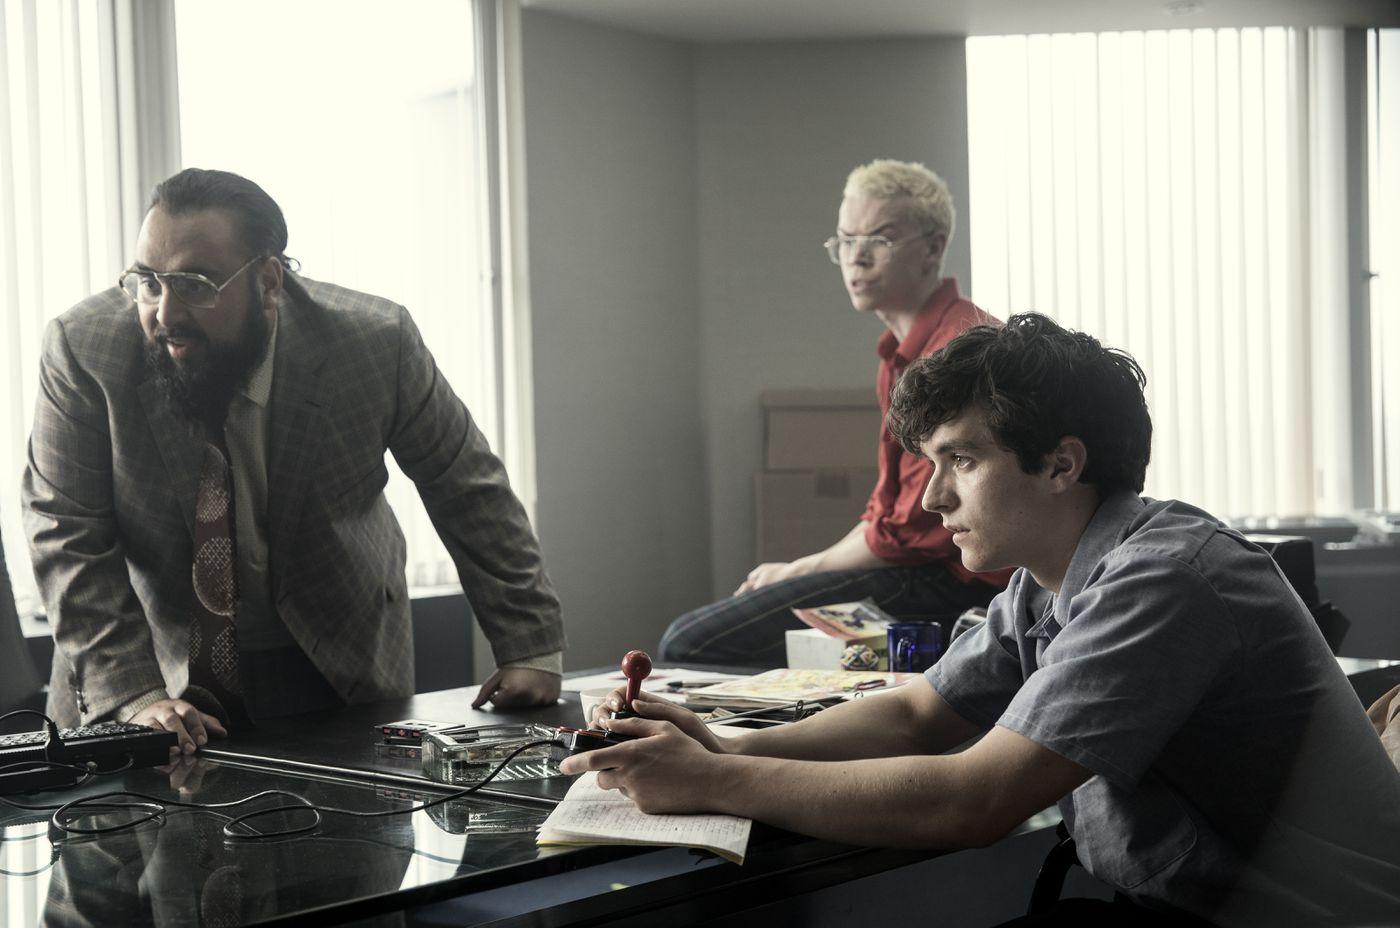 Black Mirror: Bandersnatch could be Netflix's secret marketing